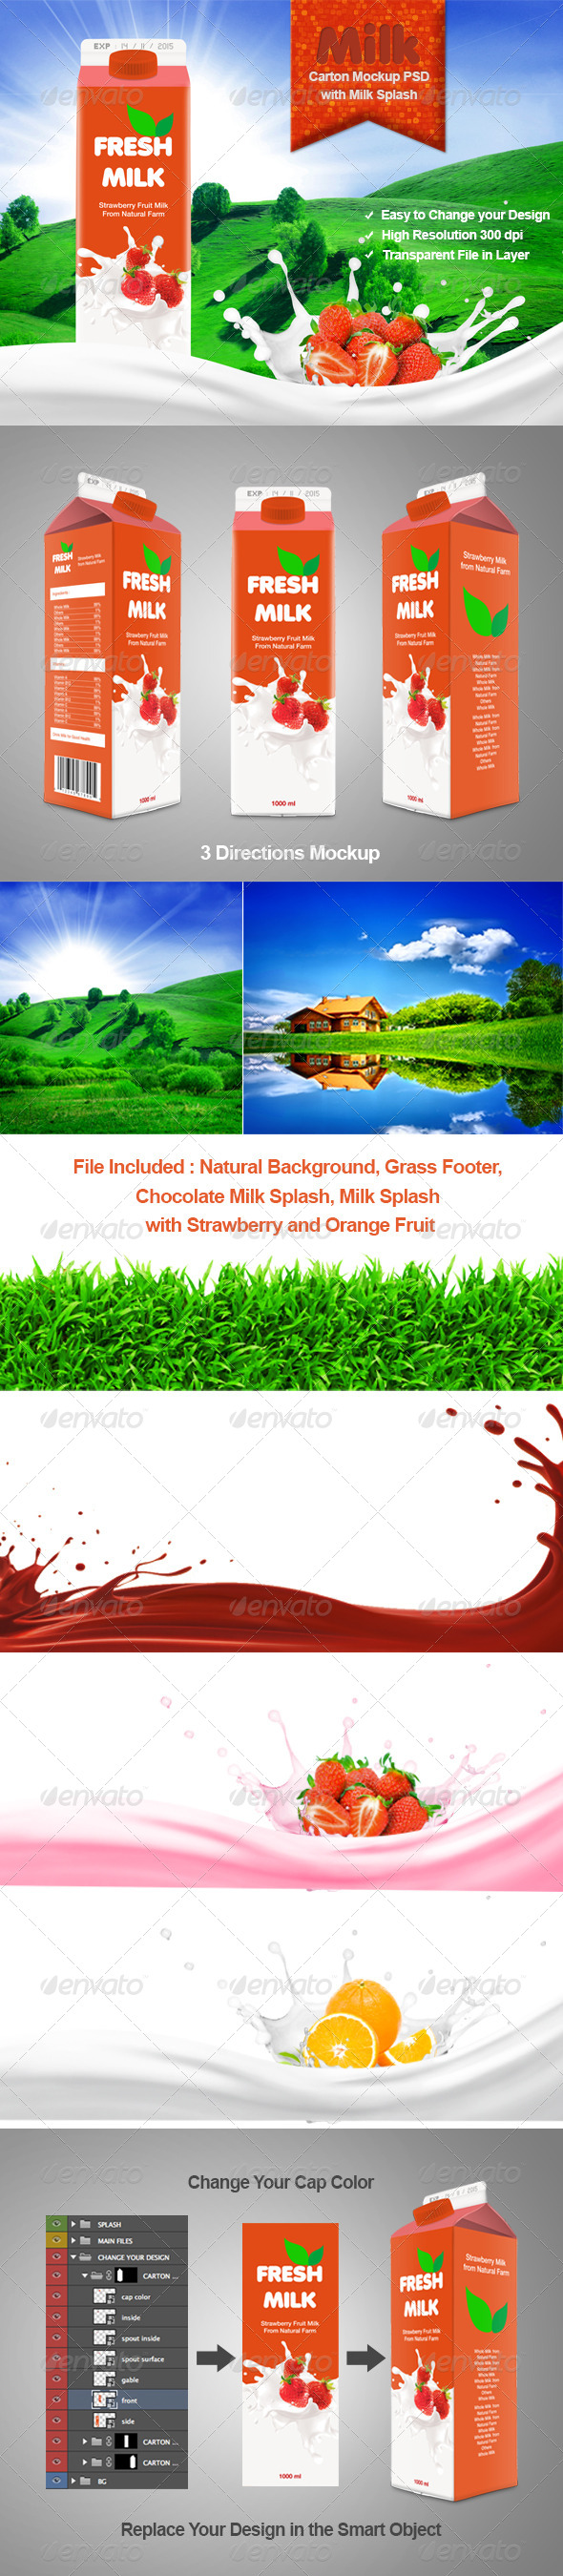 GraphicRiver Milk Carton Mockup 6442567